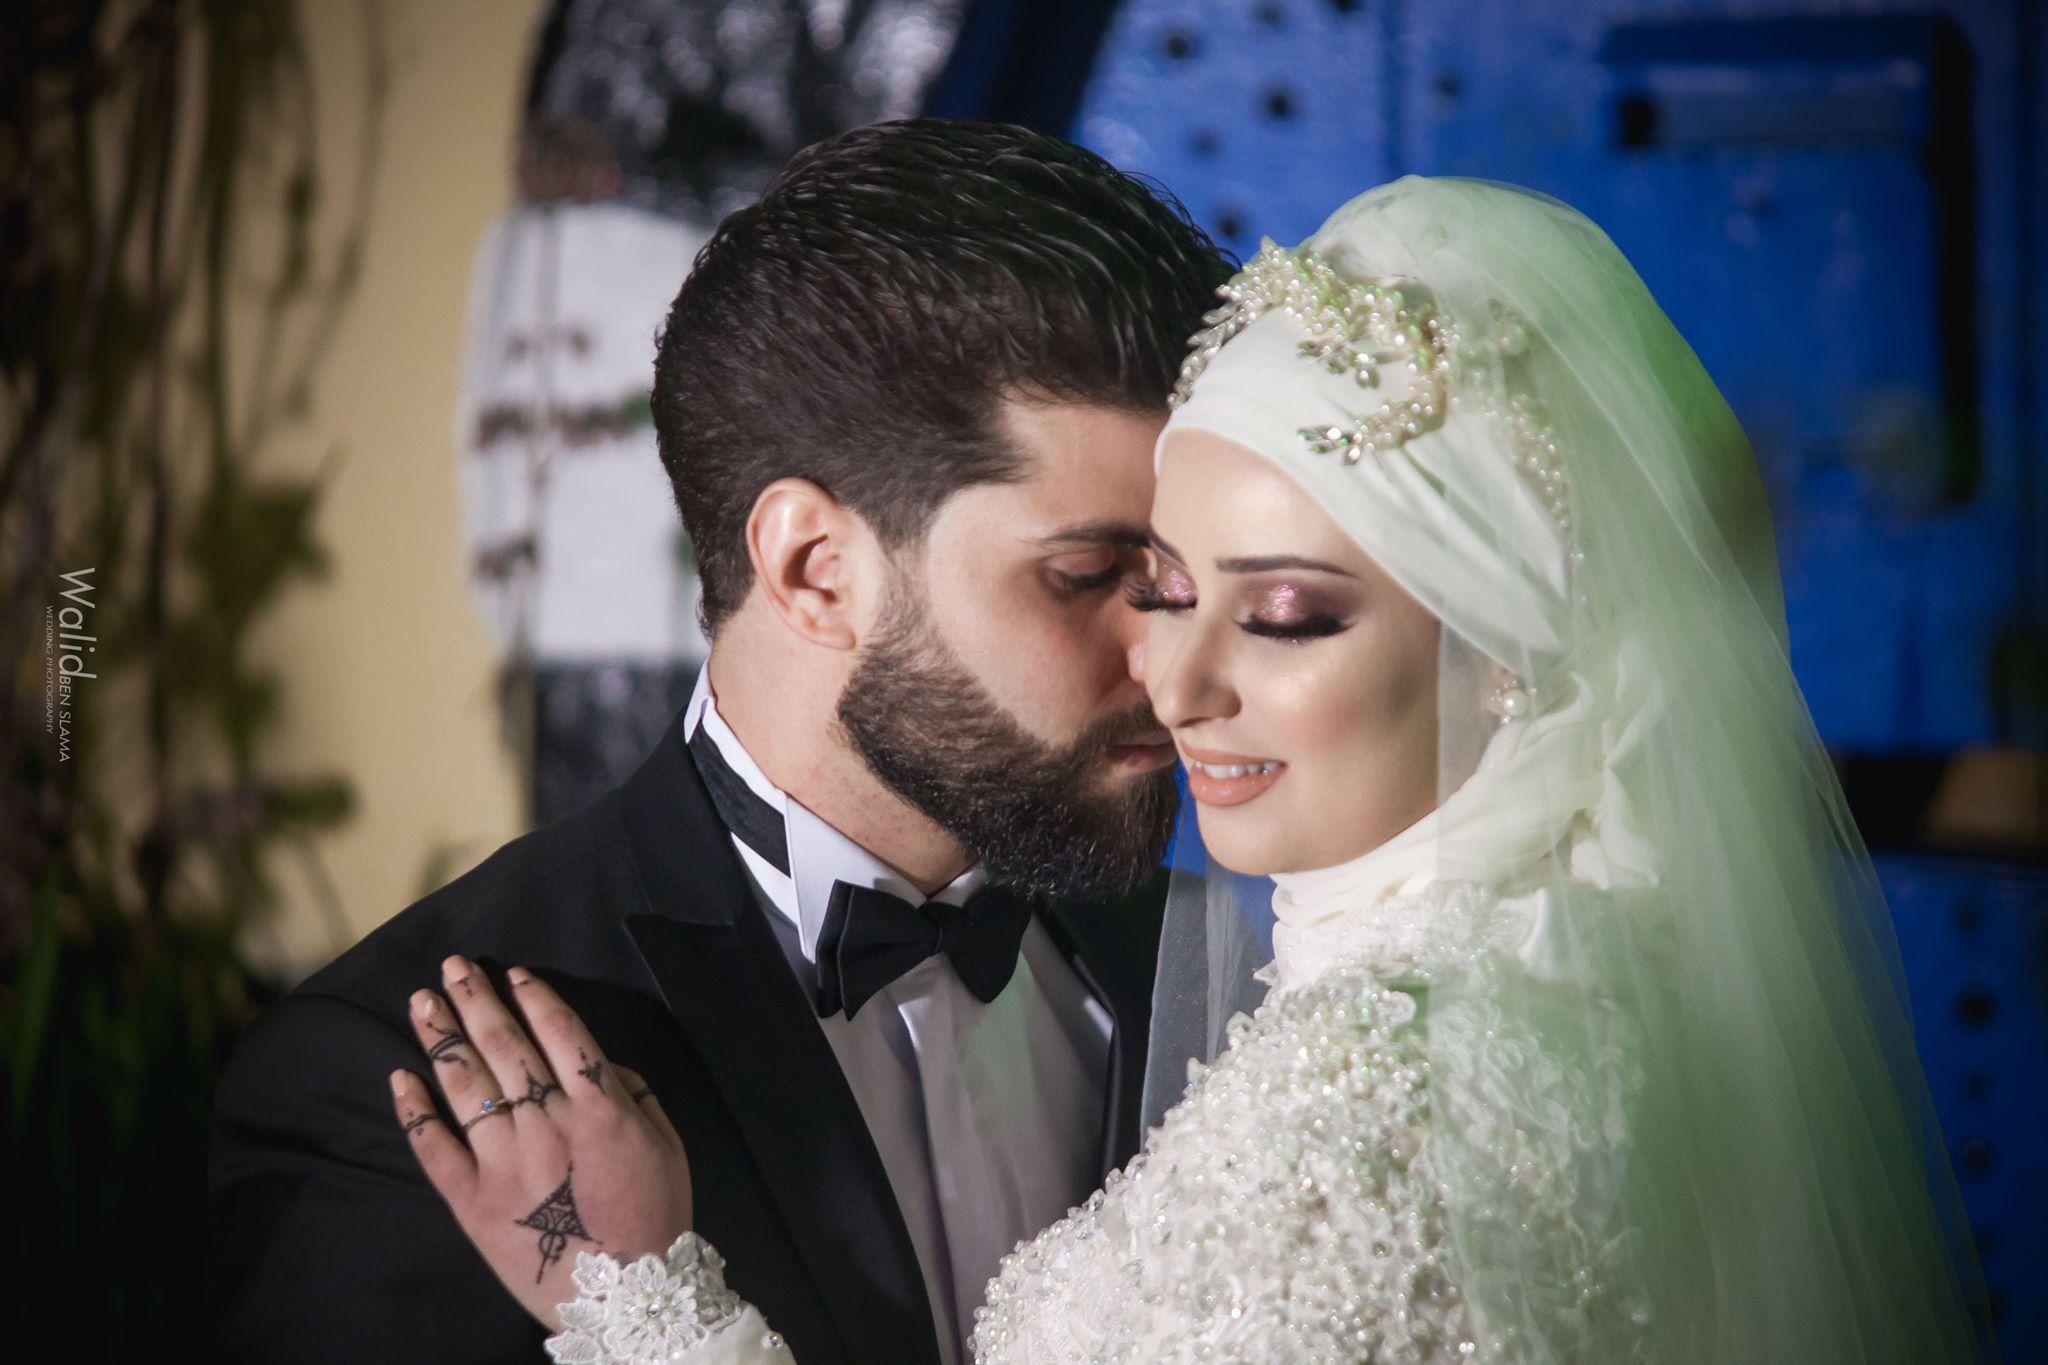 Tesnim_M3_plus_belles_mariées_tunisiennes2019